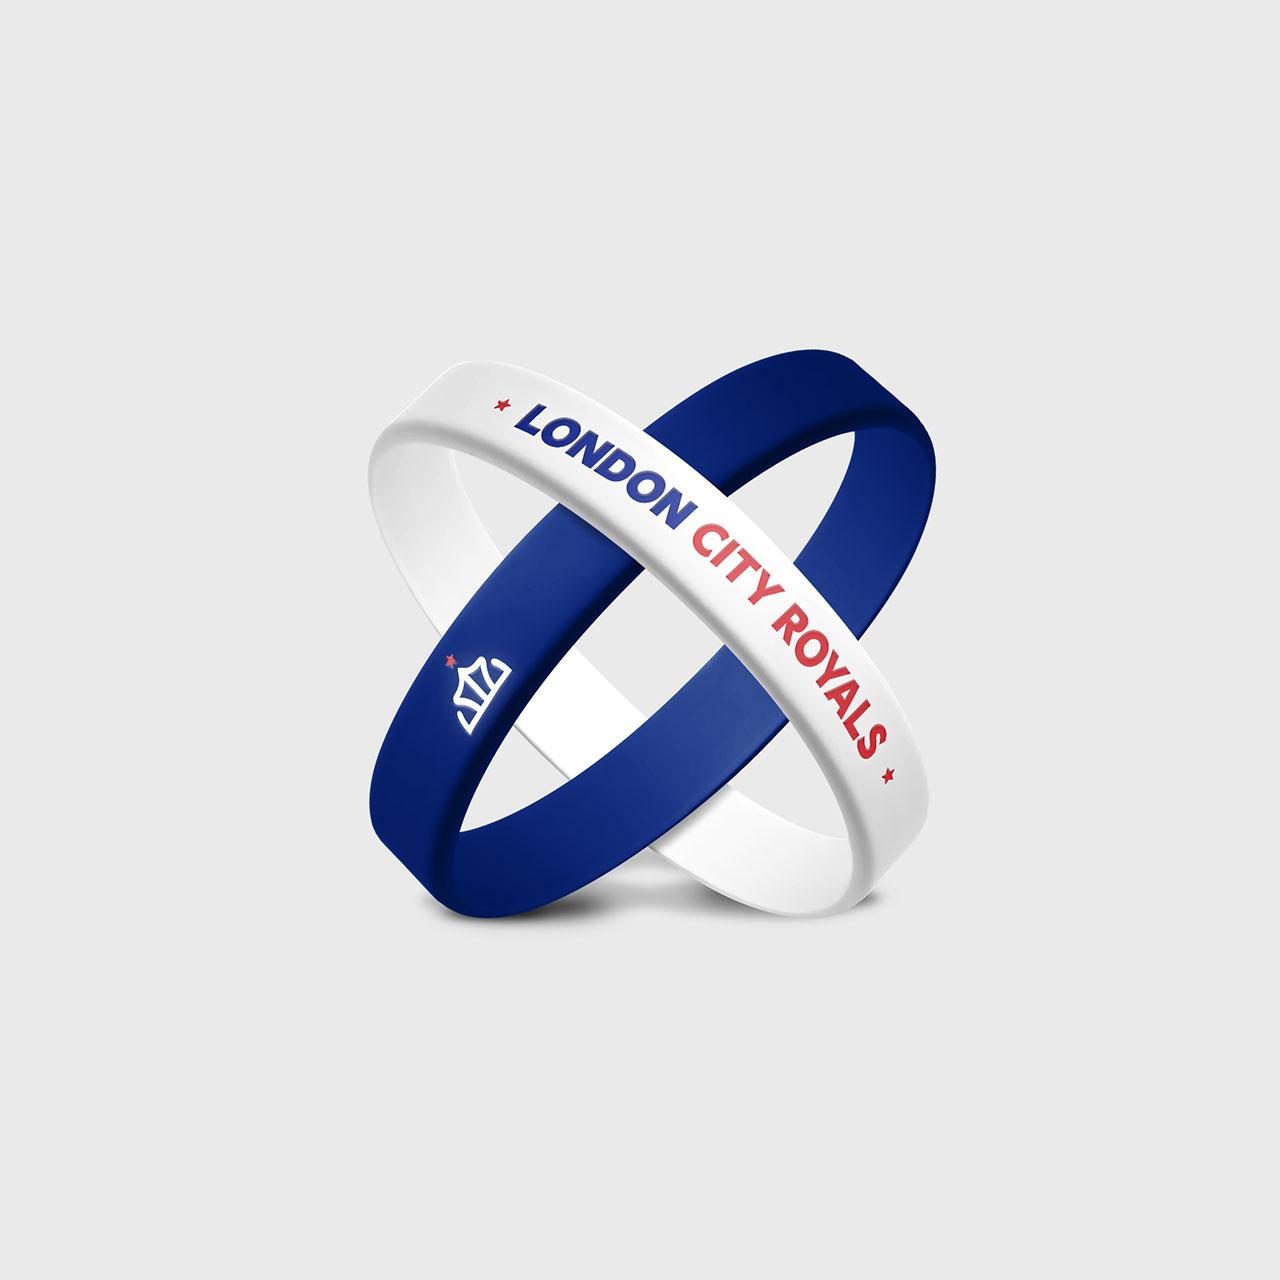 London-City-Royals-basketball-logo-branding-wristbands-by-Orfi-Media